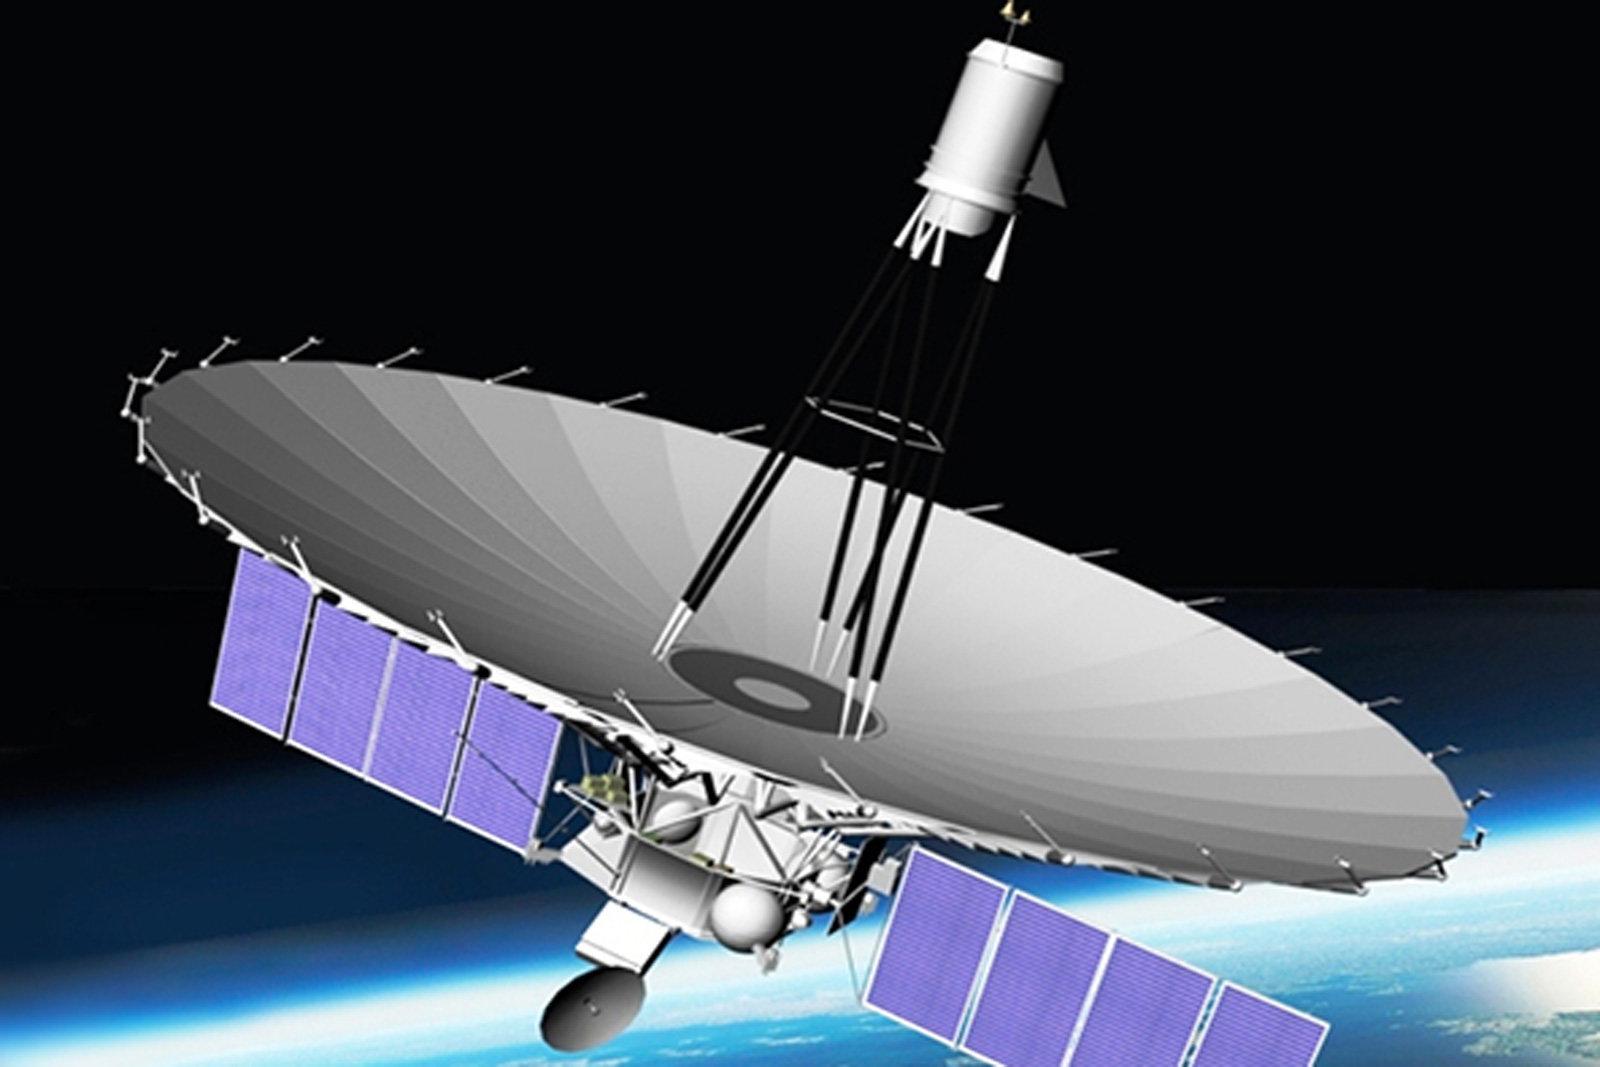 Russia has lost control of a radio telescope orbiting